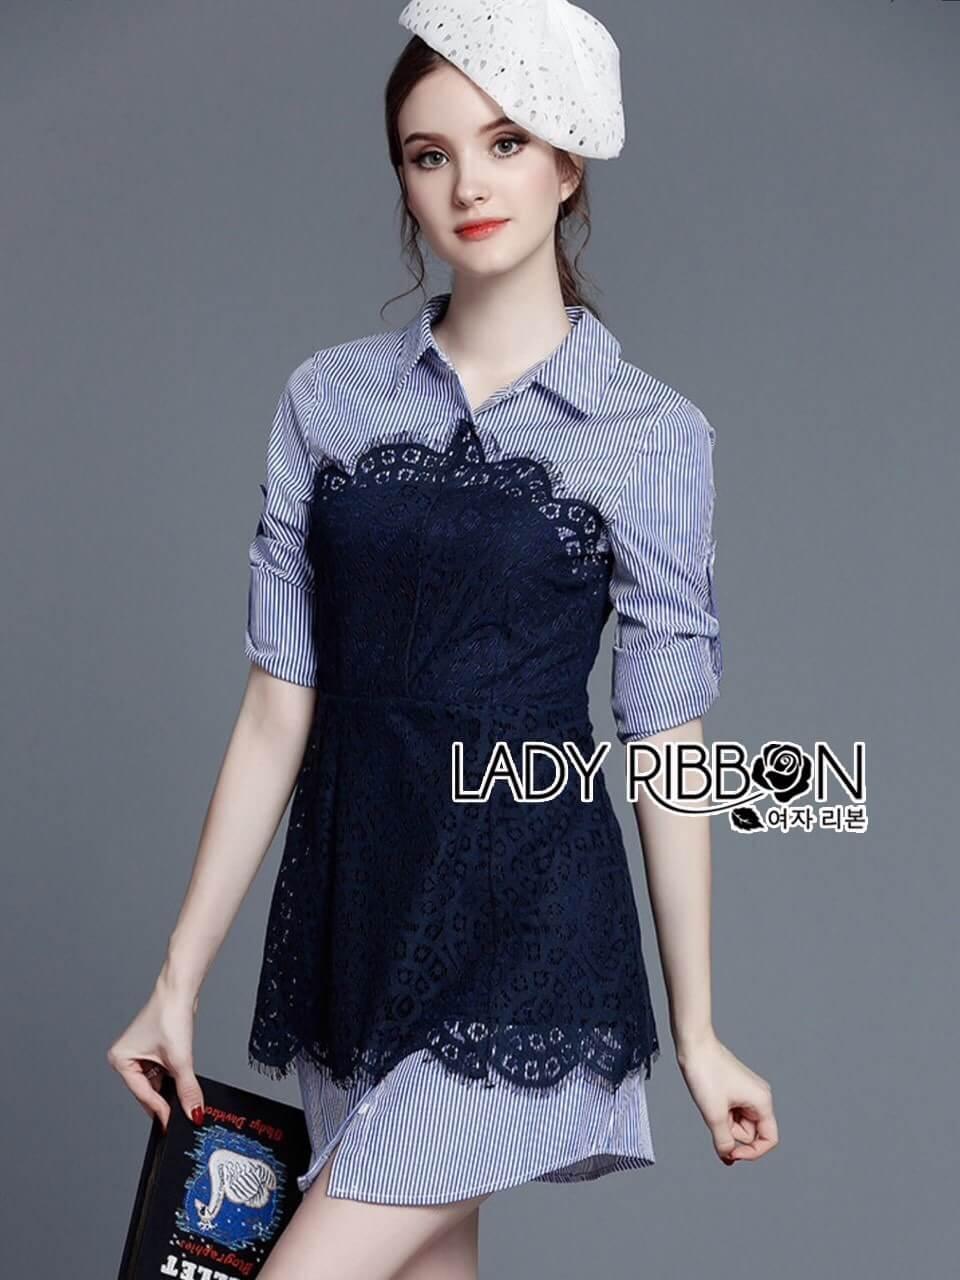 &#x1F380 Lady Ribbon's Made &#x1F380 Lady Jennifer Sexy Striped Poplin Cotton and Dark Blue Lace Shirt Dress